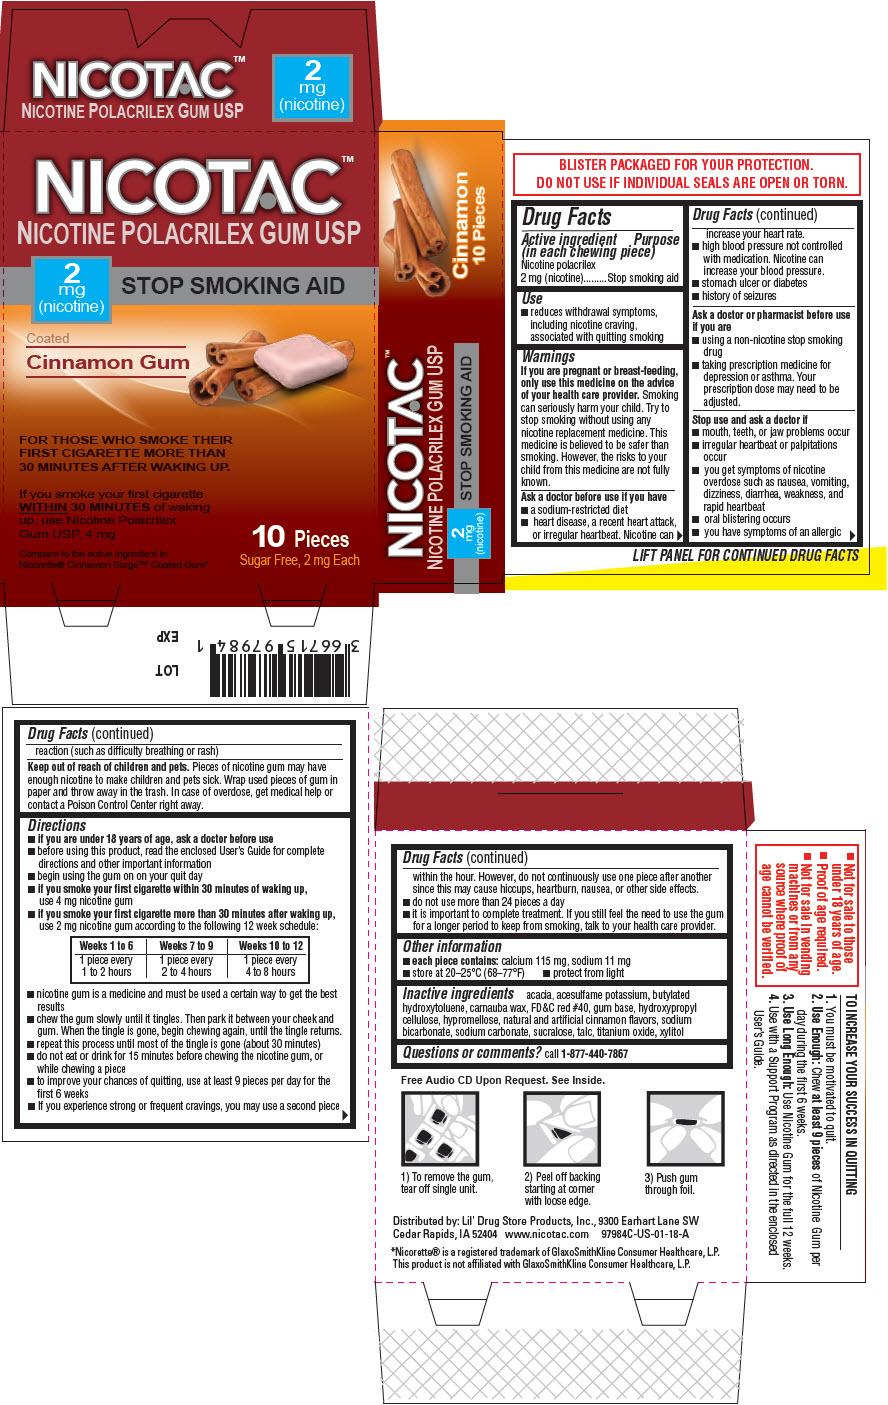 Nicotine - Coated Cinnamon (Nicotac Nicotine Polacrilex)